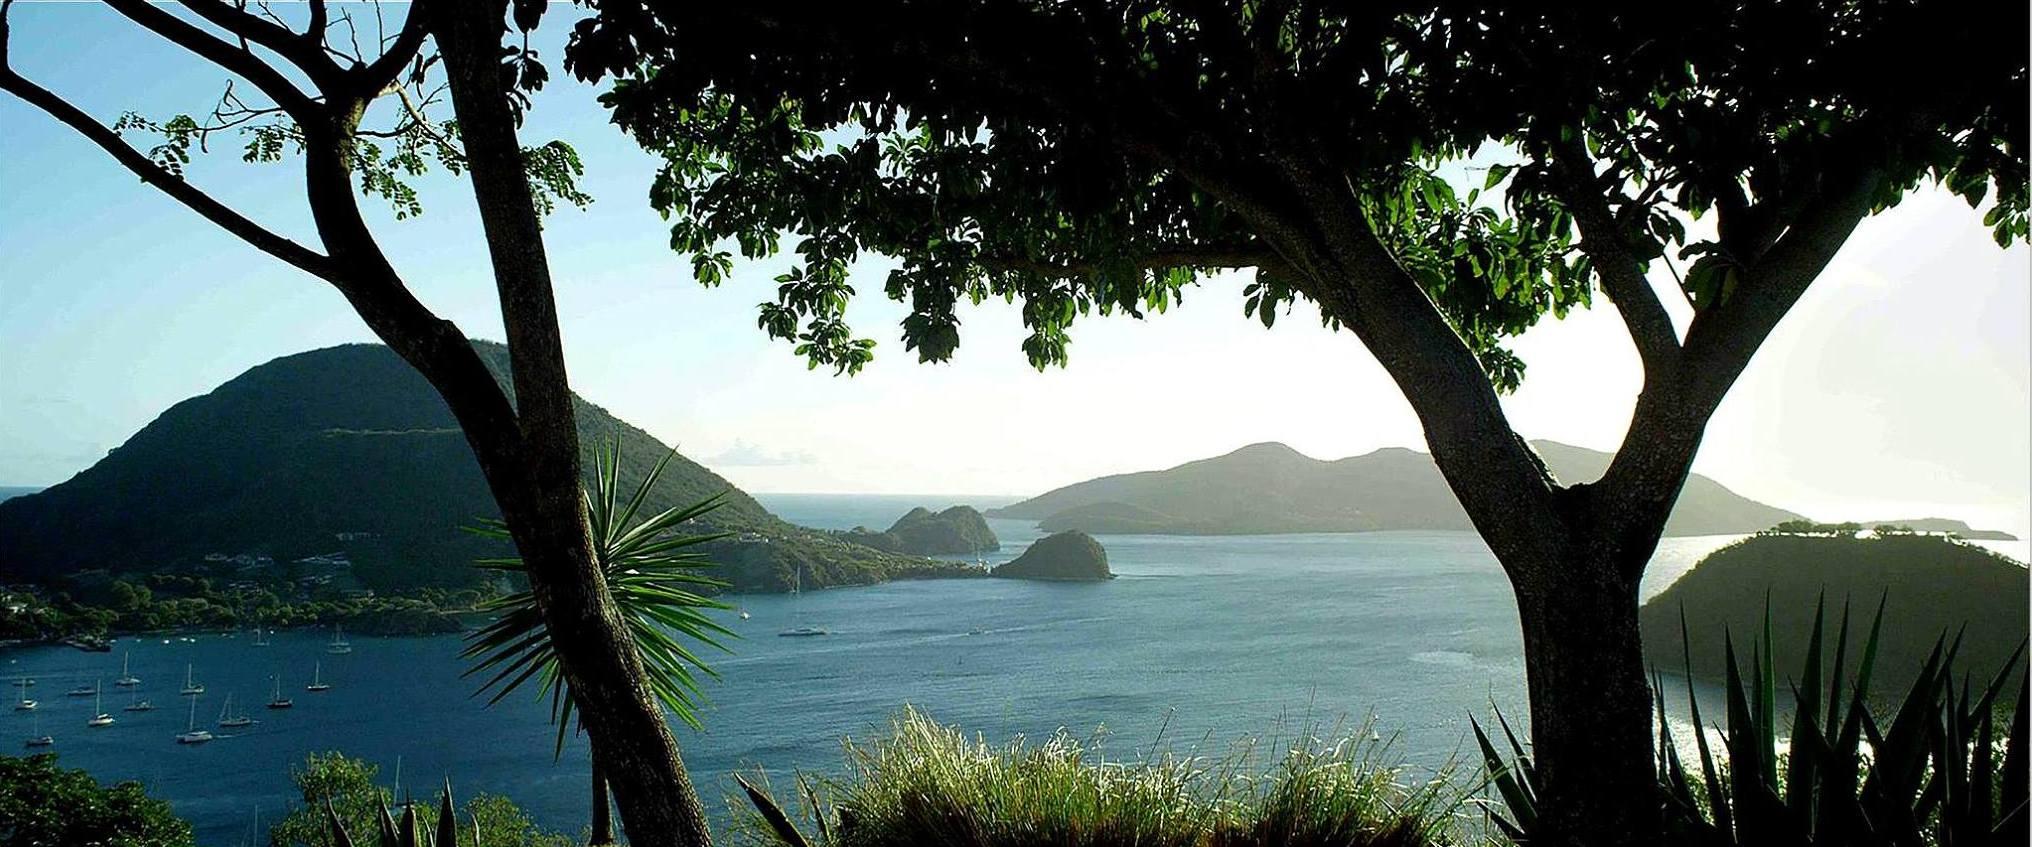 Anoli Location_Baie des Saintes_Guadeloupe